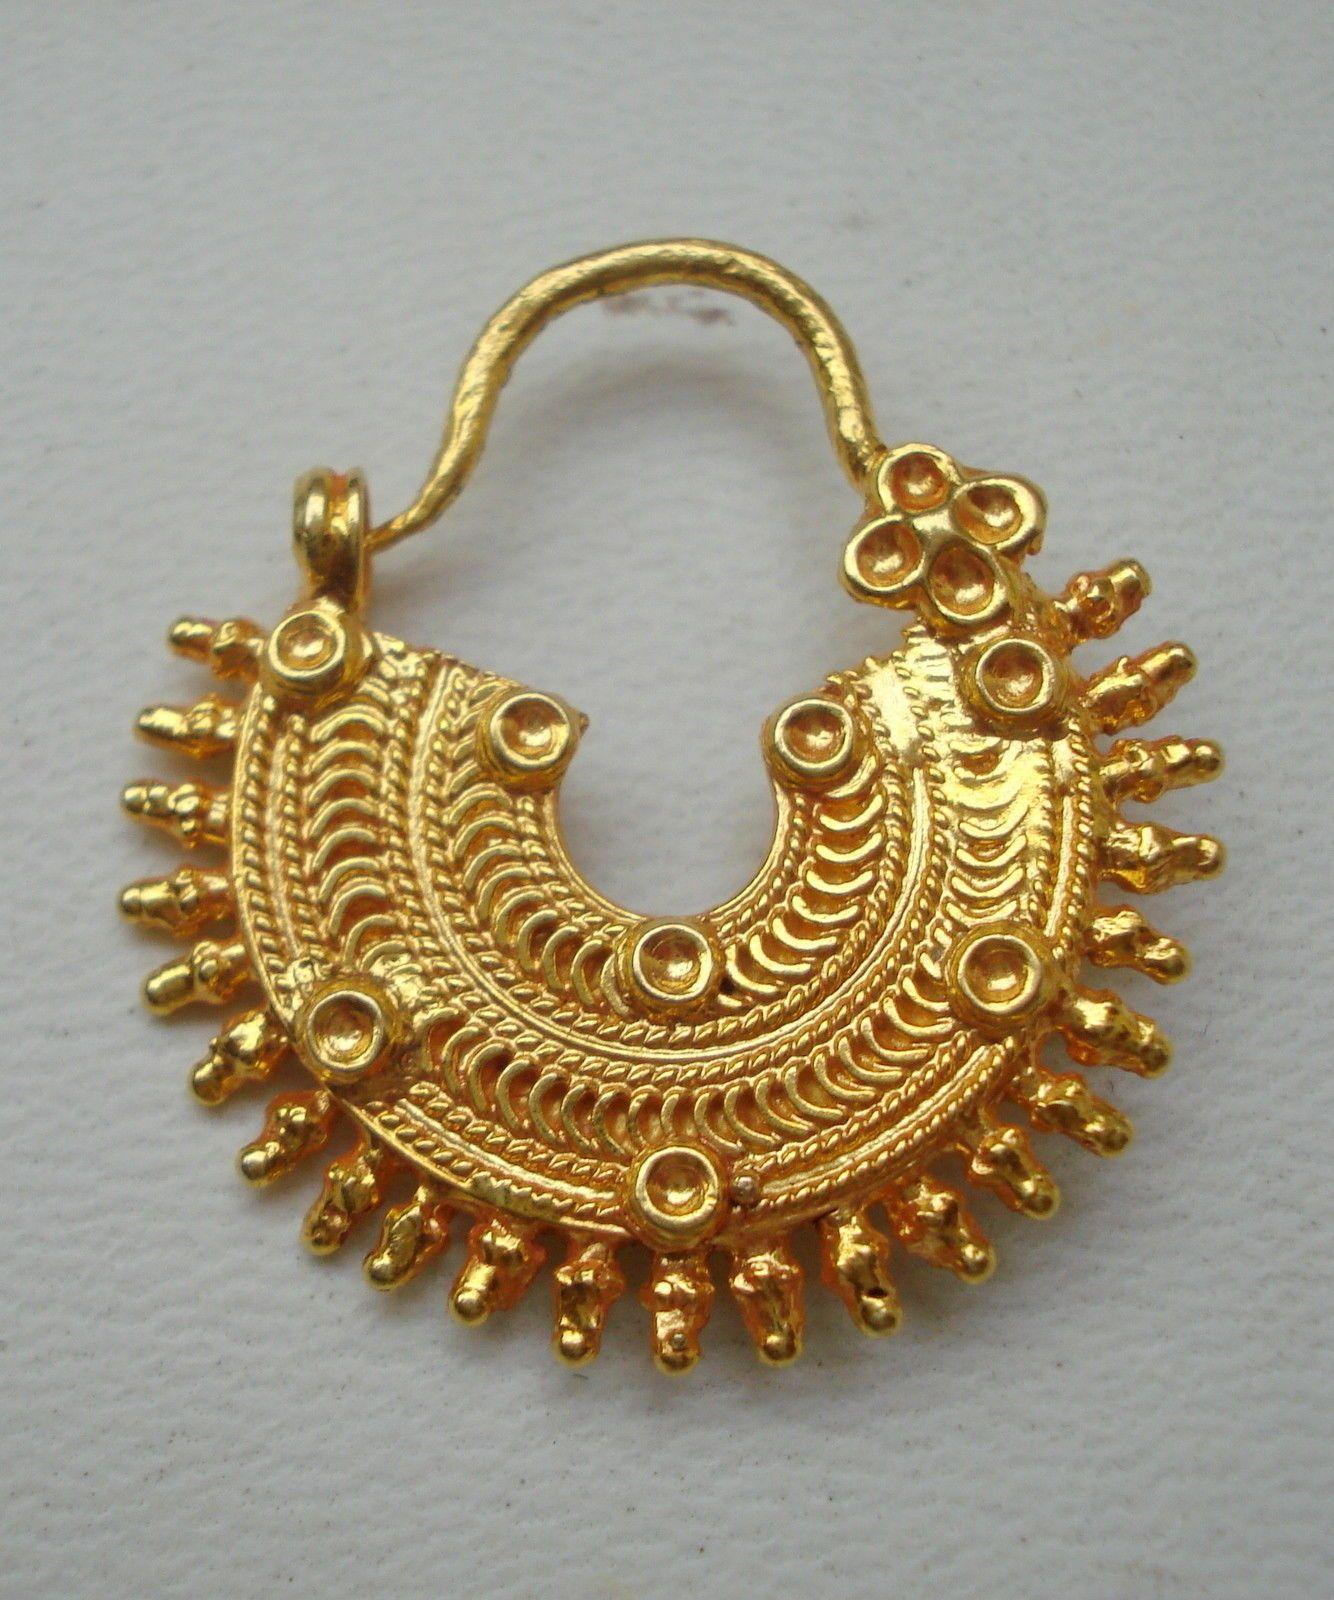 traditional design 20k gold nose ring nath nose ornament rajasthan ...